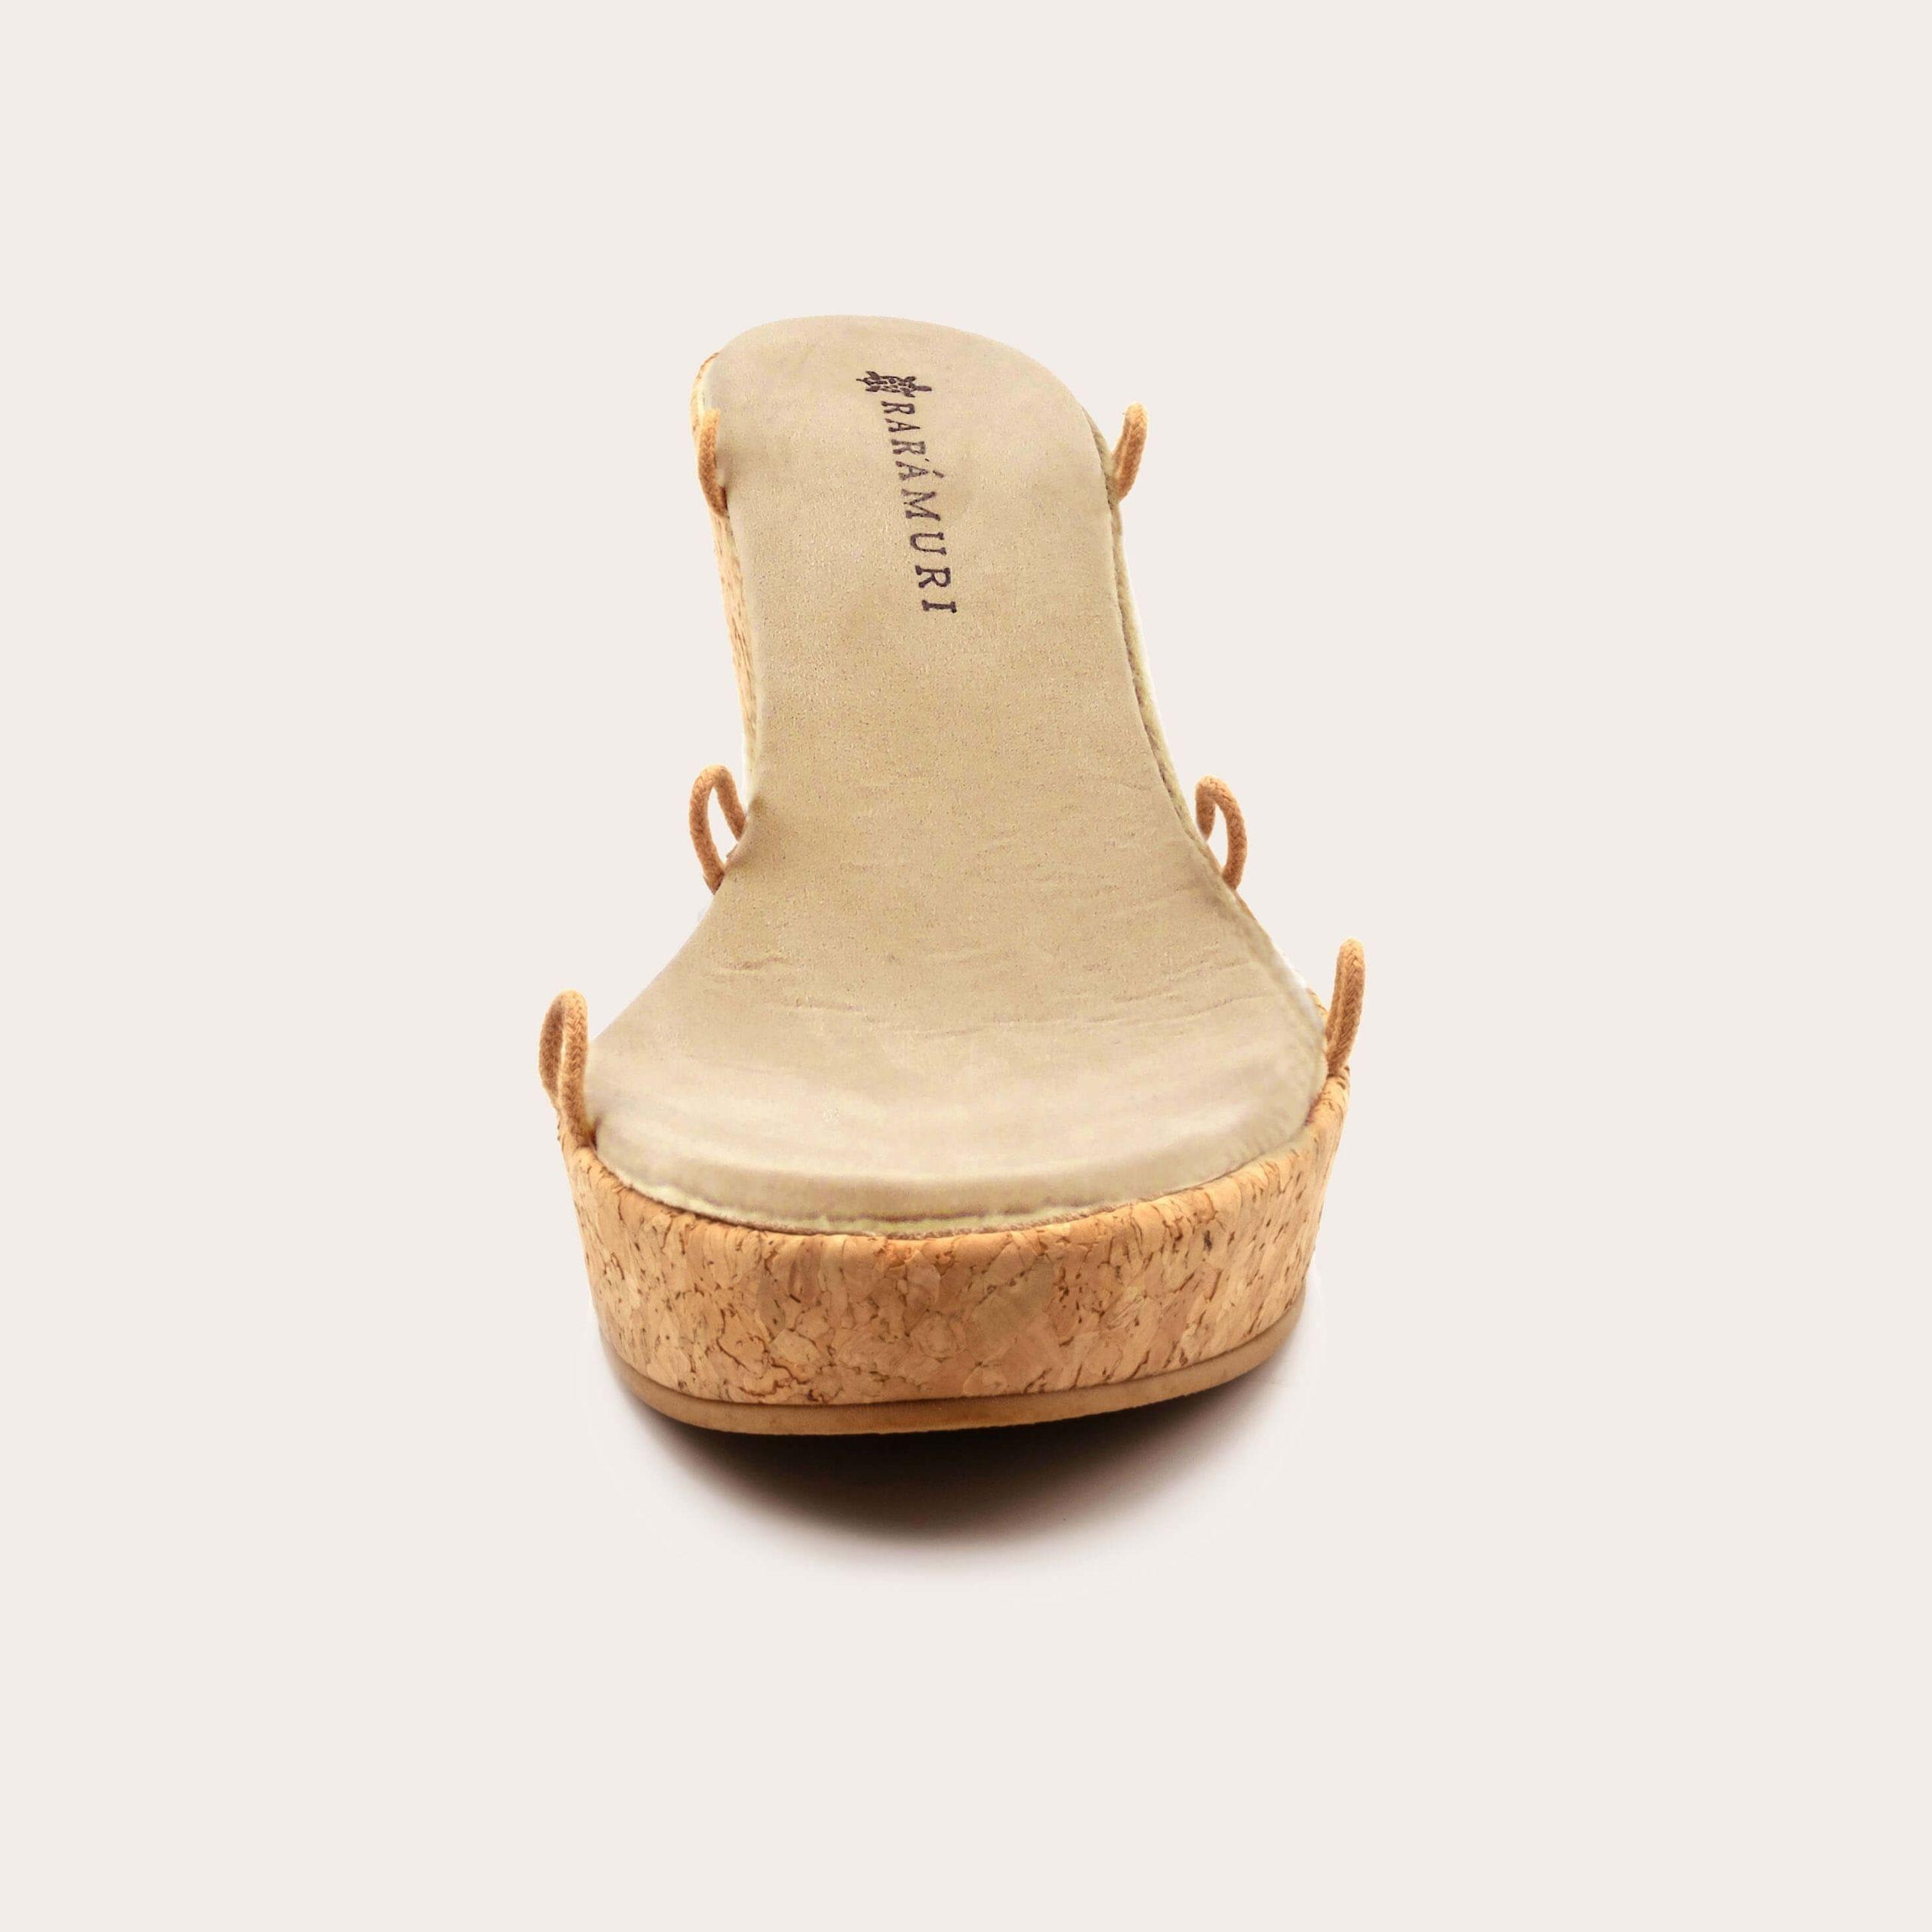 chilon-cork-3_lintsandalen sandals travelsandals vegan sustainable sandals wikkelsandalen